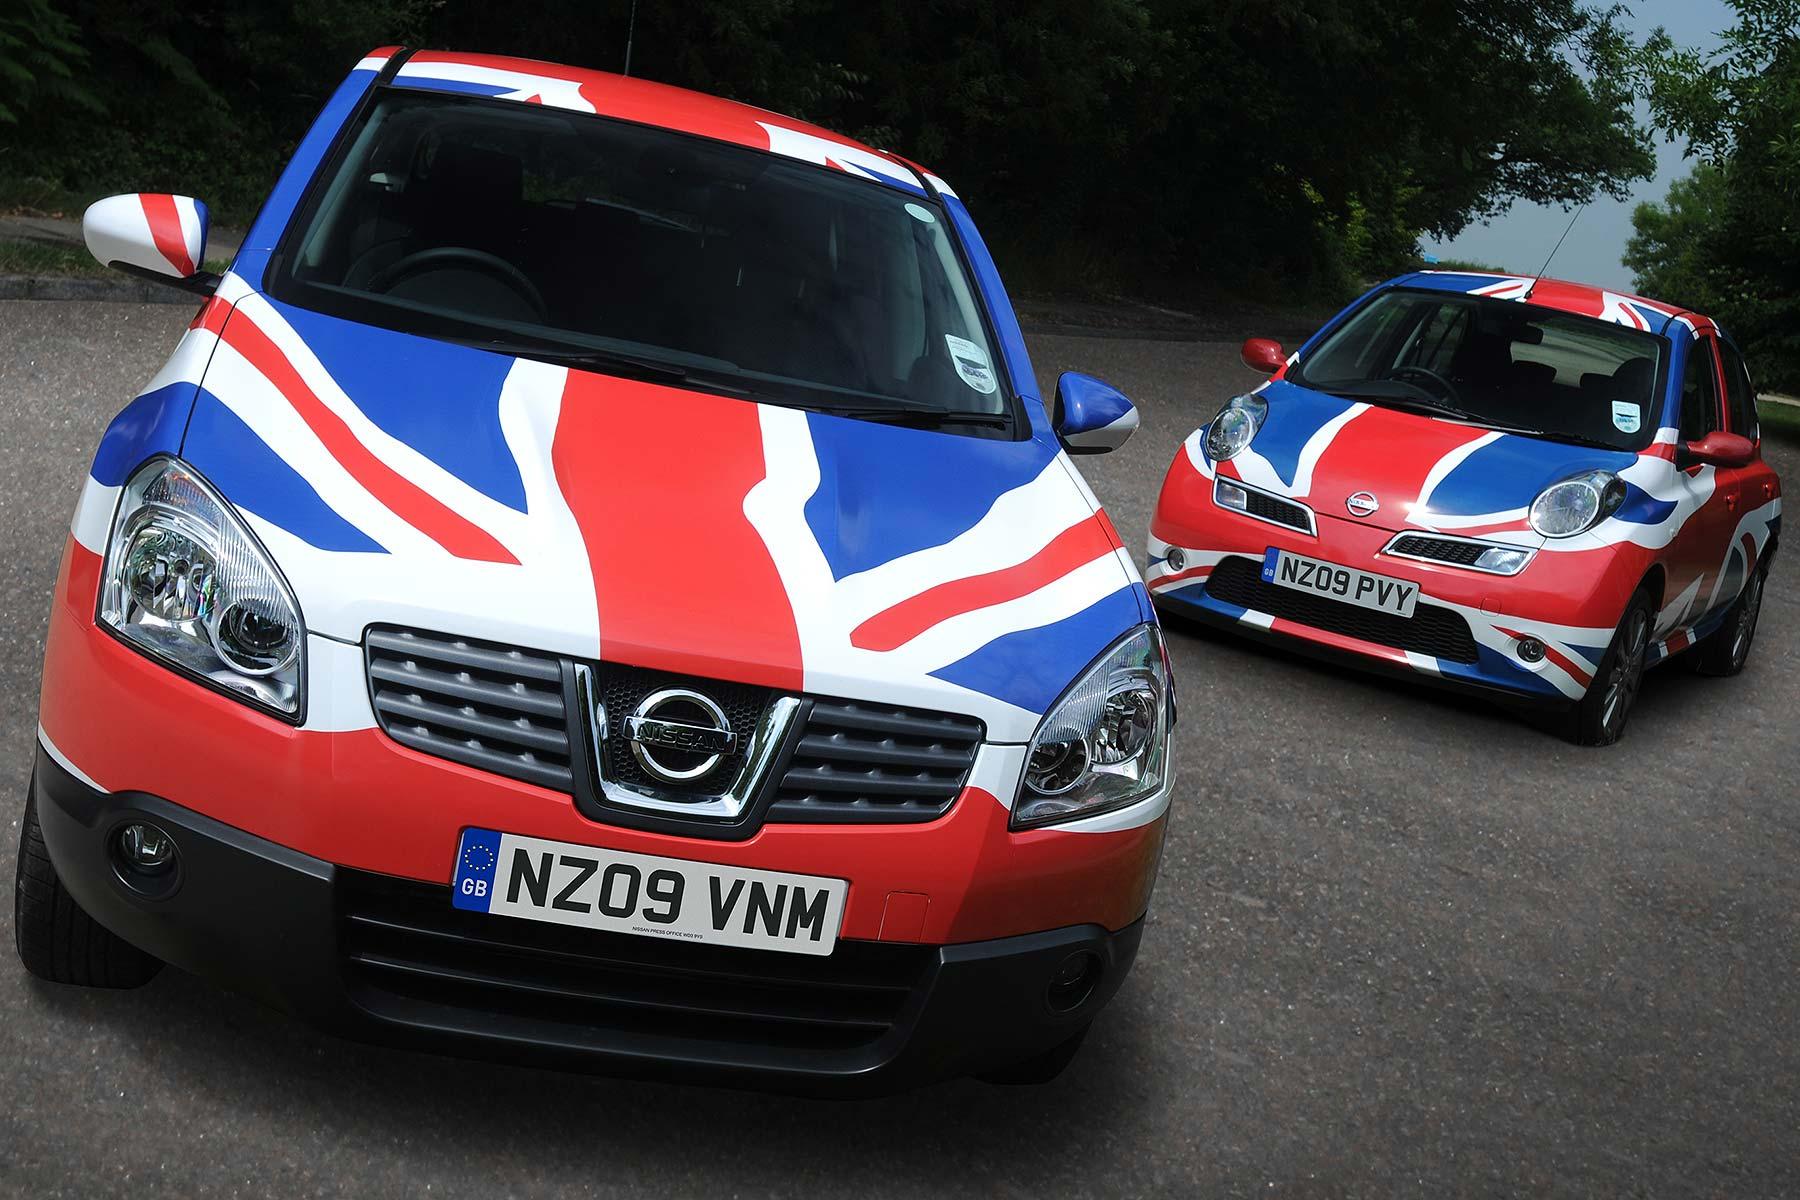 Nissan увеличит инвестиции в Великобритании после Brexit 1